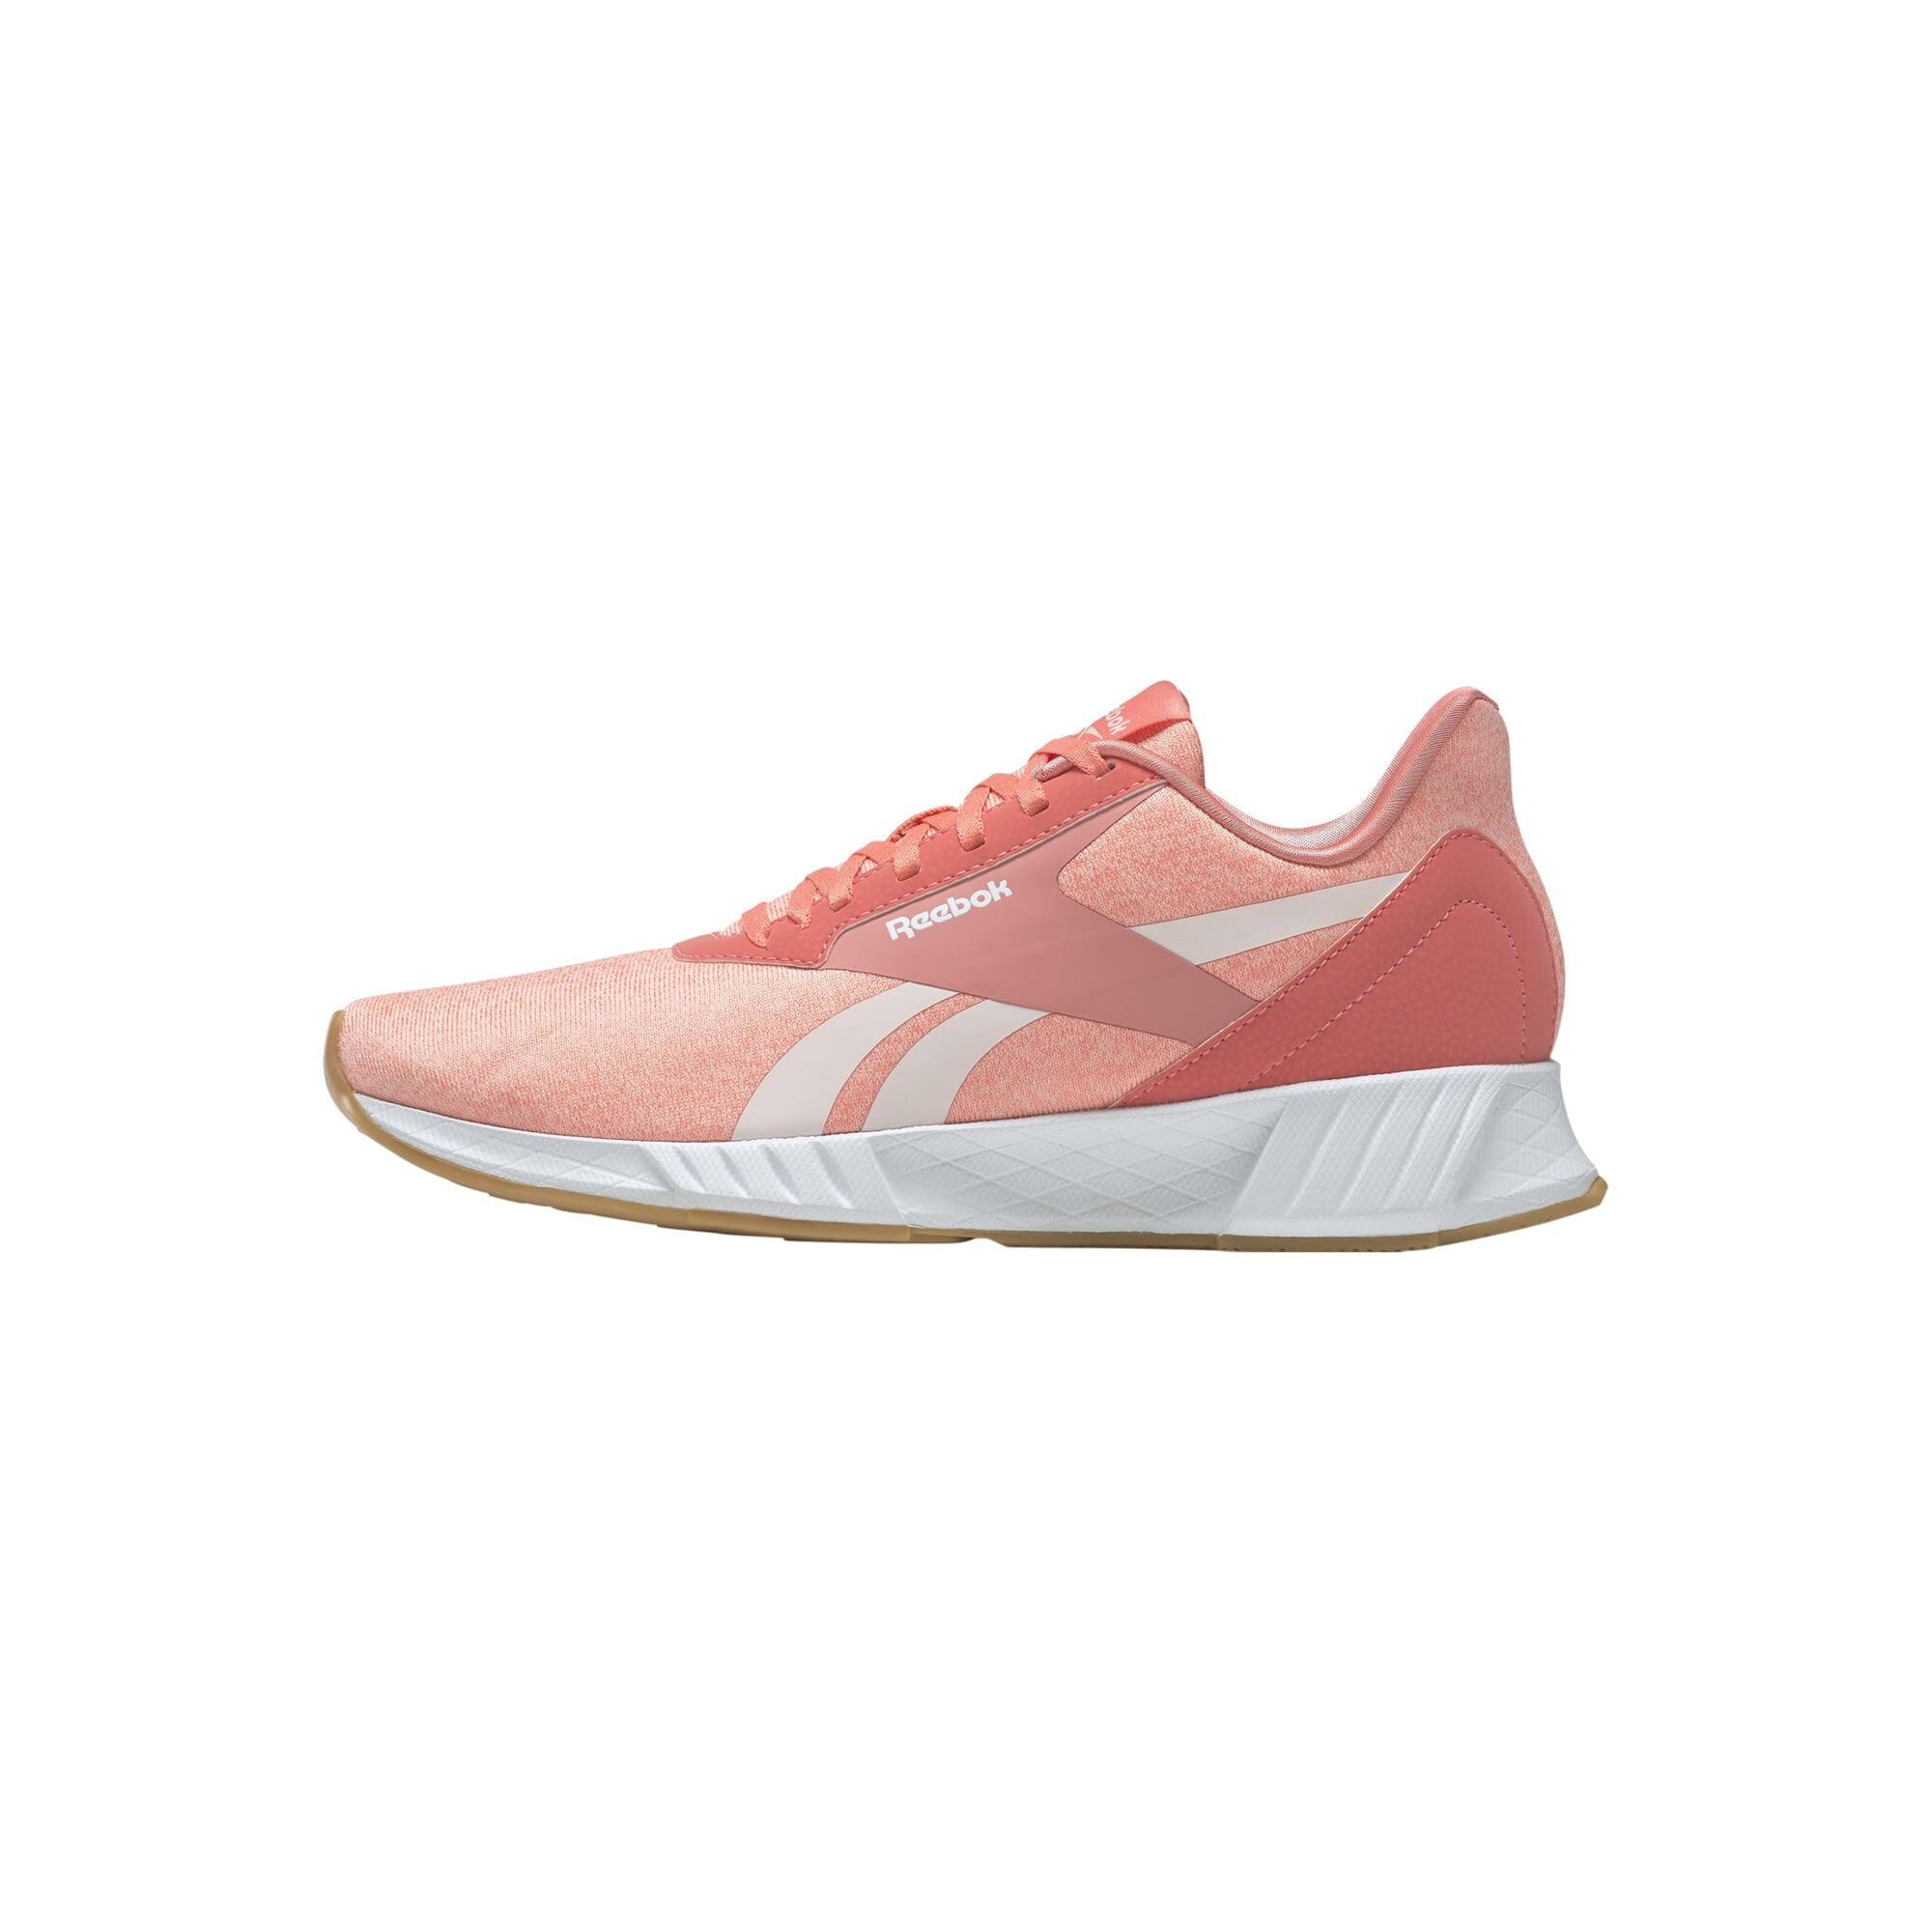 Reebok Sport Chaussure de course  - Rose - Taille: 3.5 - female